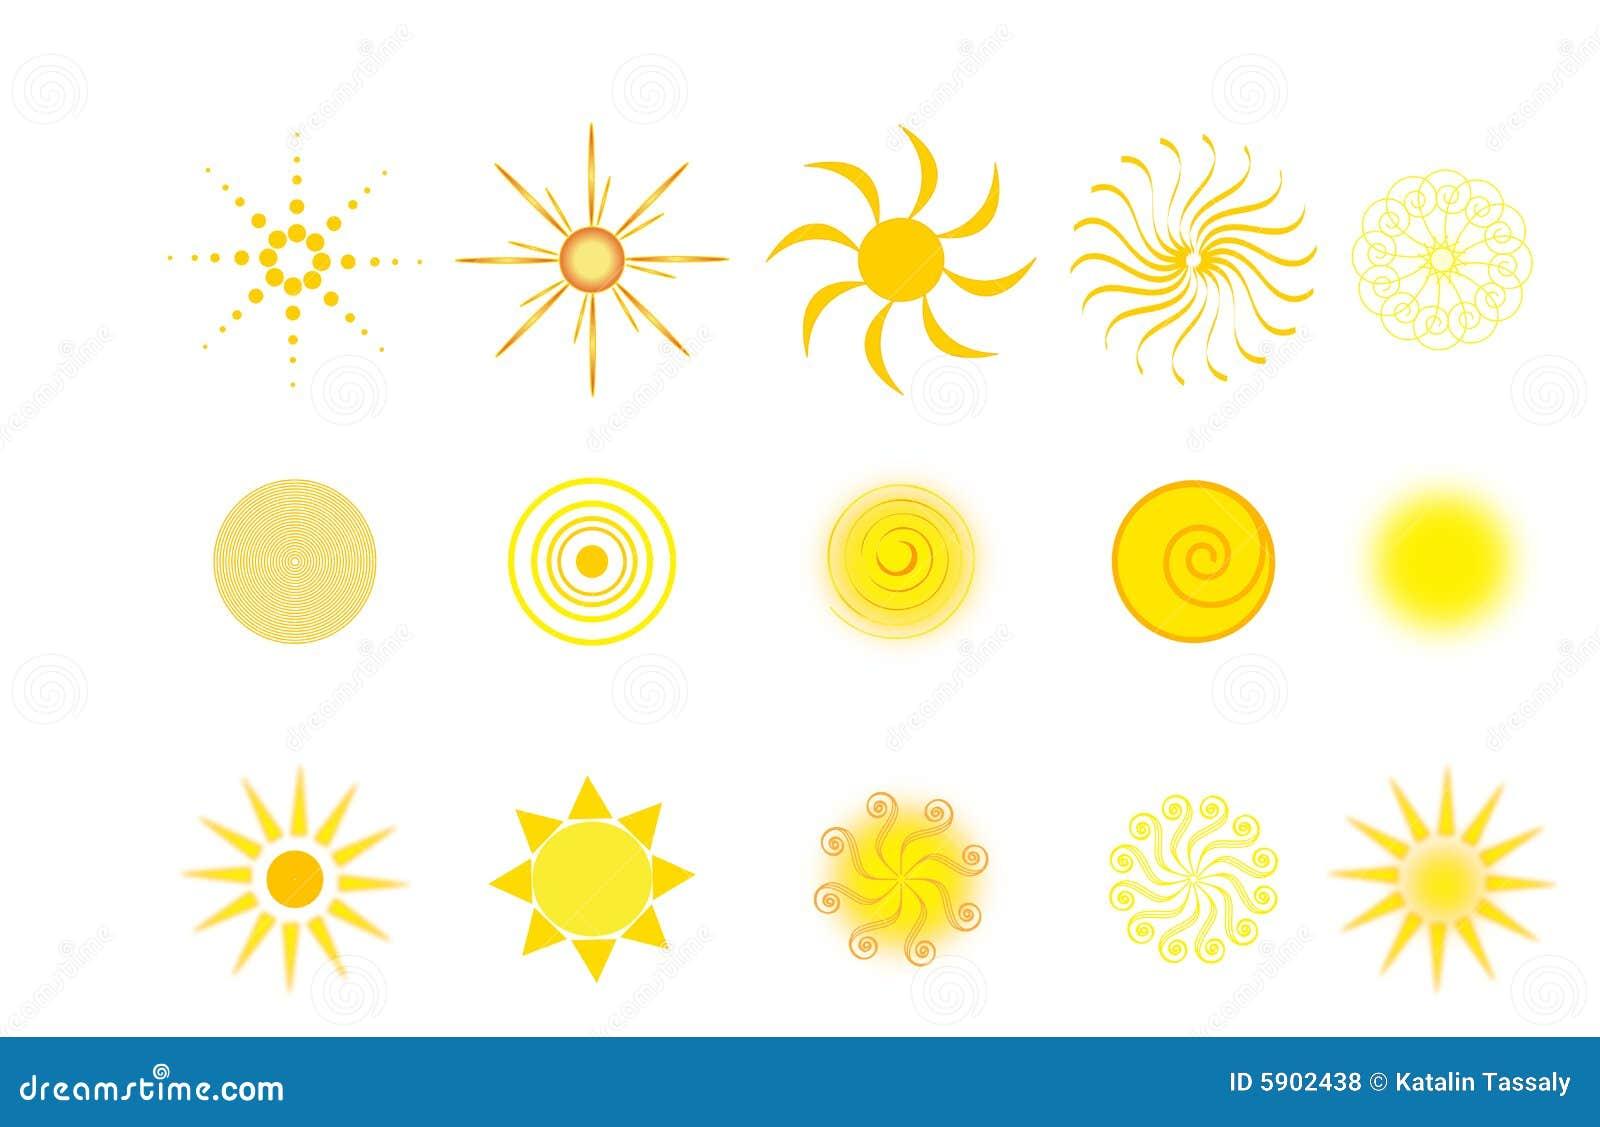 Company Logos Design Free Download